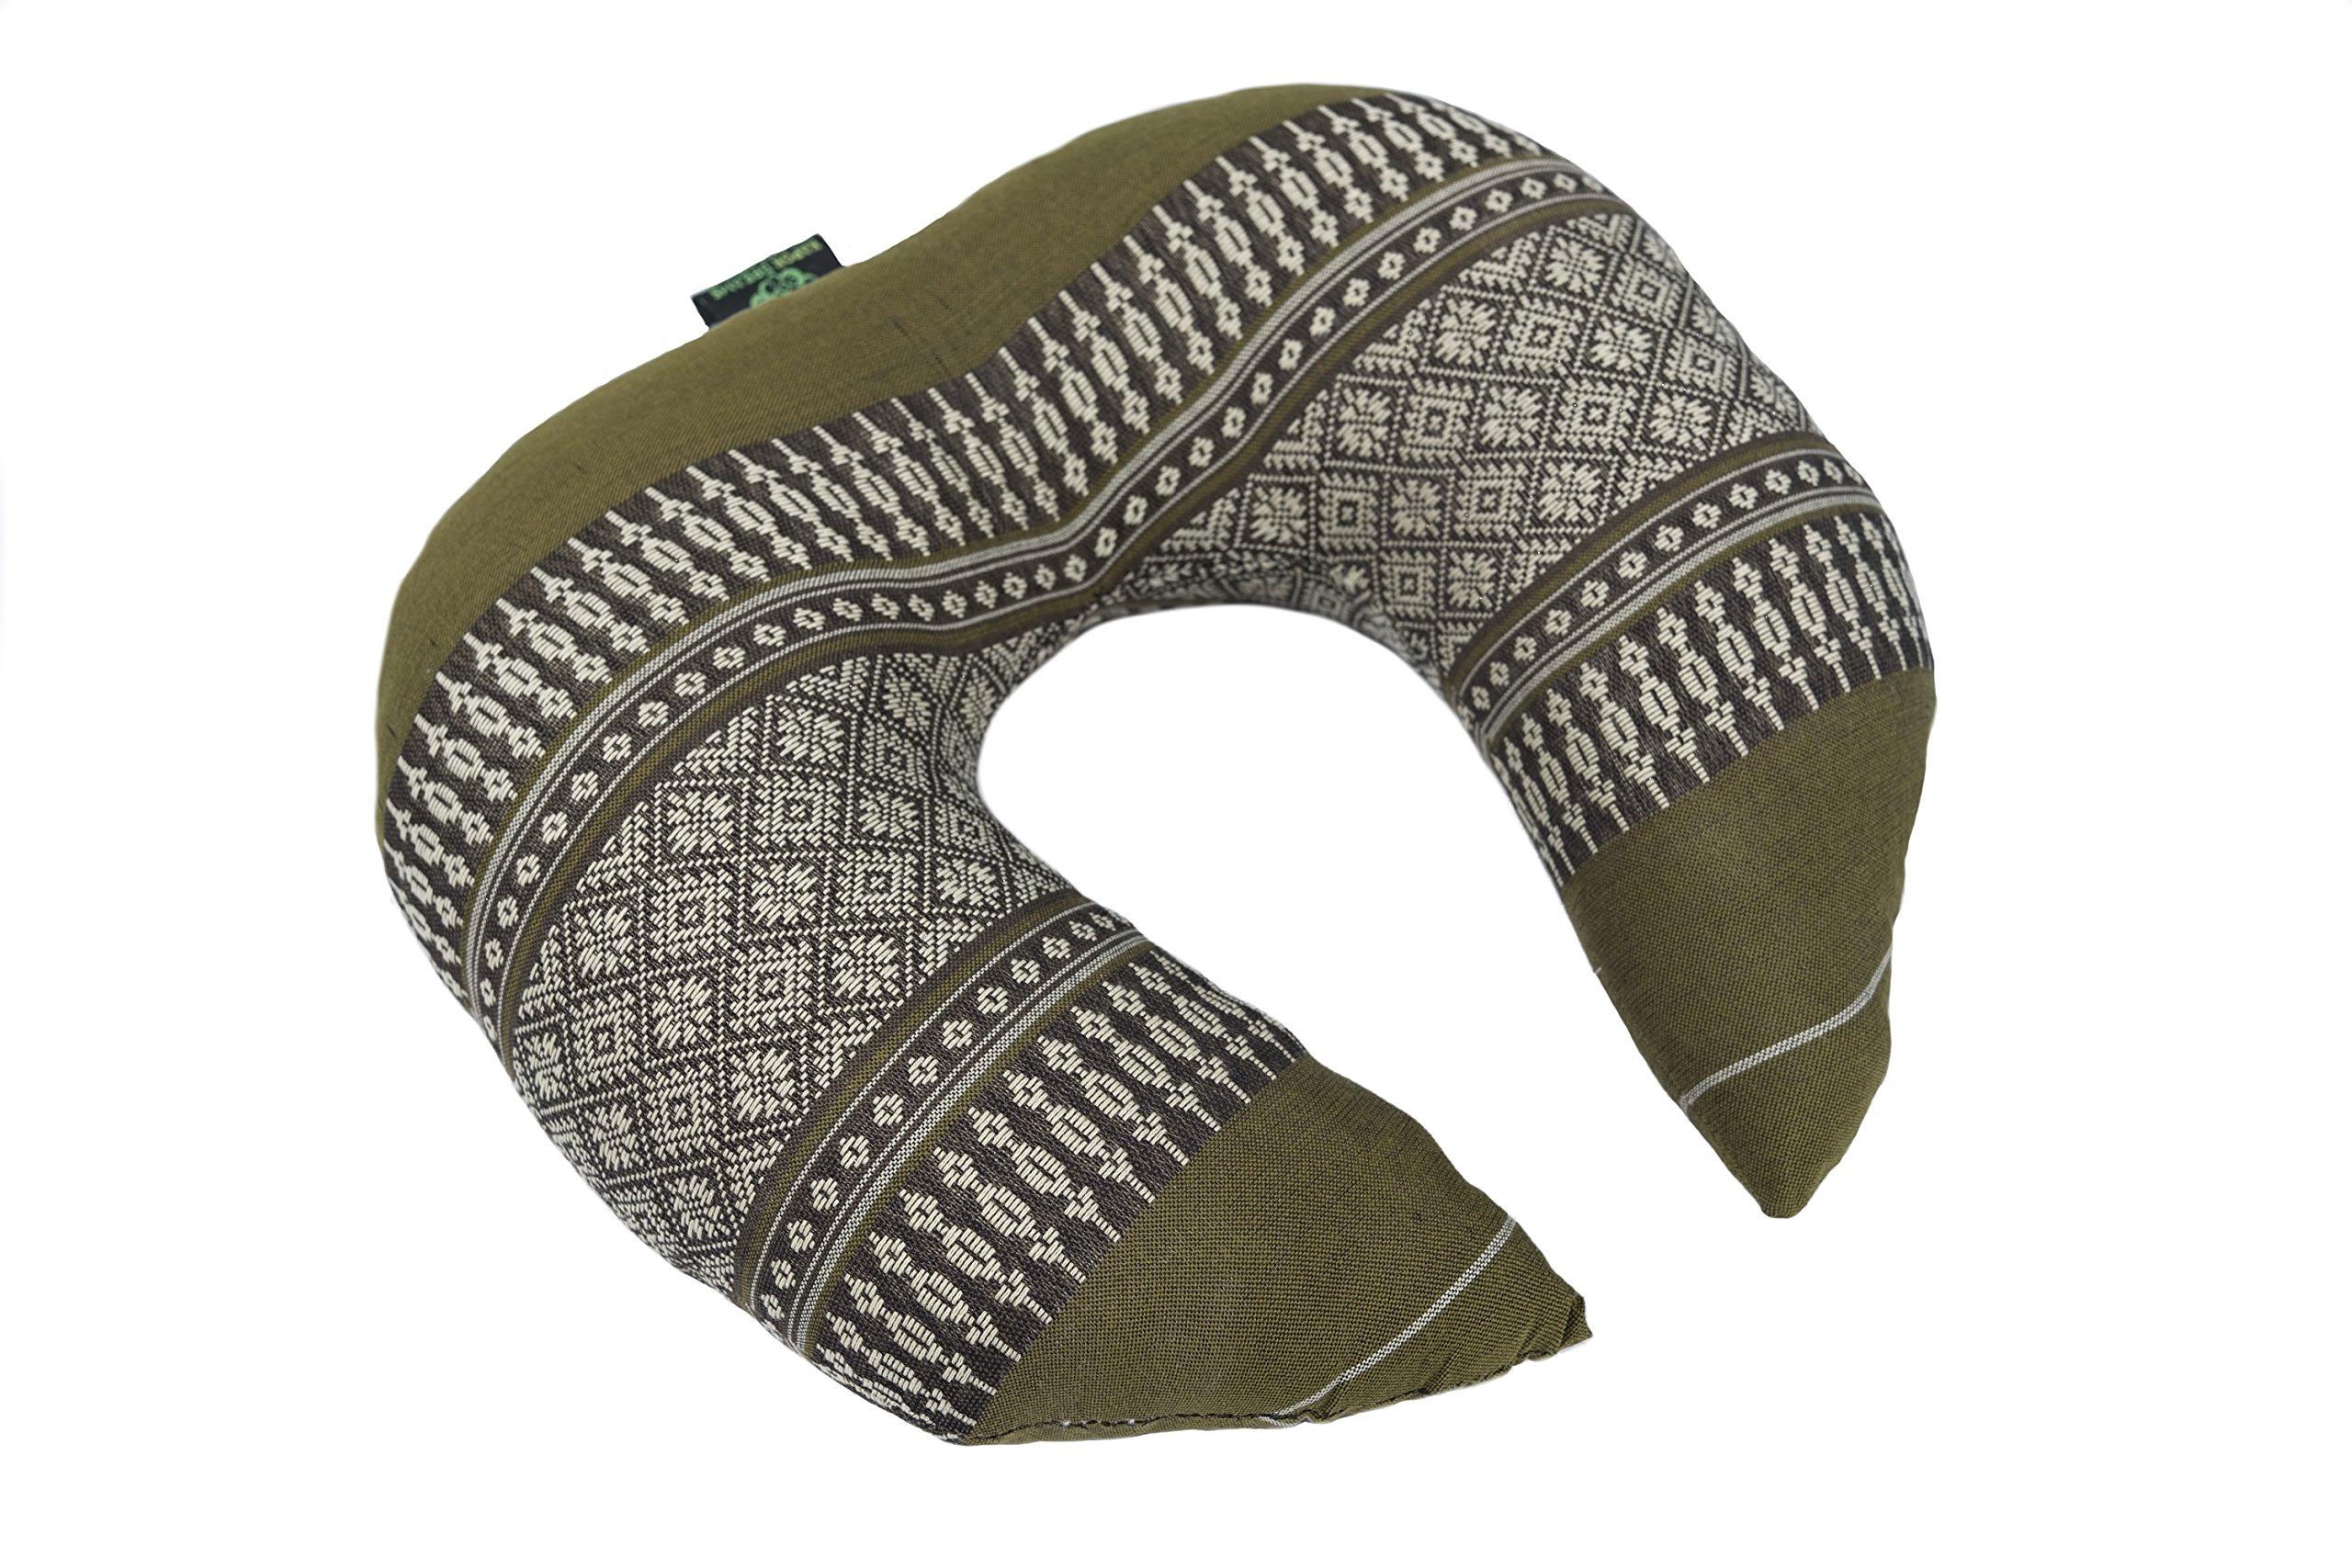 Kapok Dreams Face Cradle Cushion, 12''x11''x4'', 100% Natural Kapok Filling, Very Firm! Neck Cushion, Bamboo Green Design.